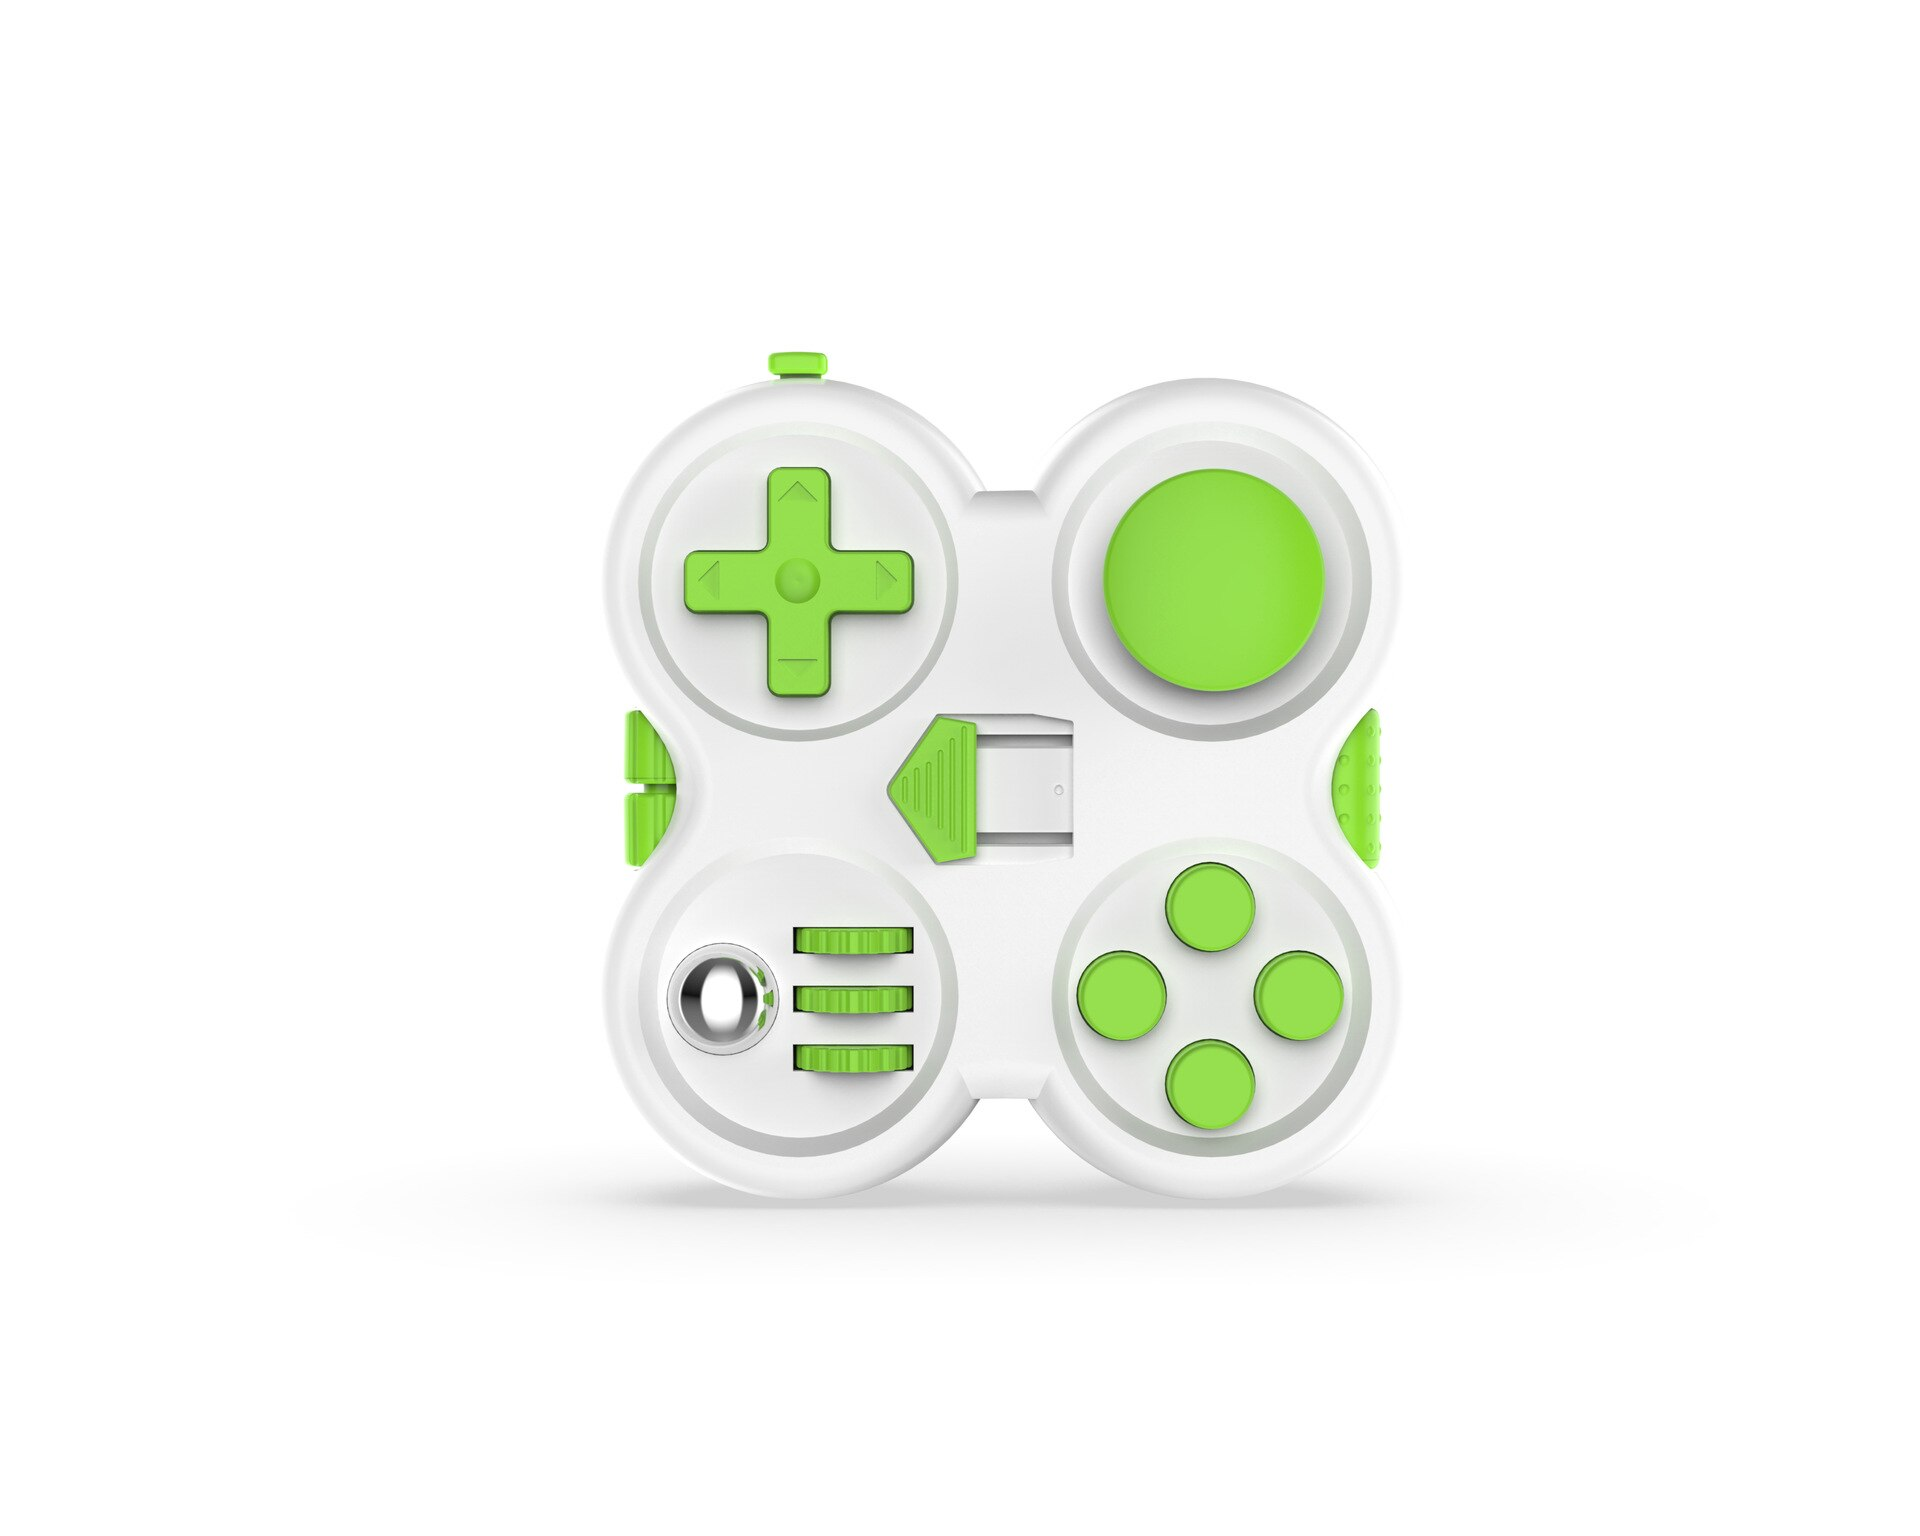 fidget pad handle controller type 1 fidget toy 5336 - Wacky Track